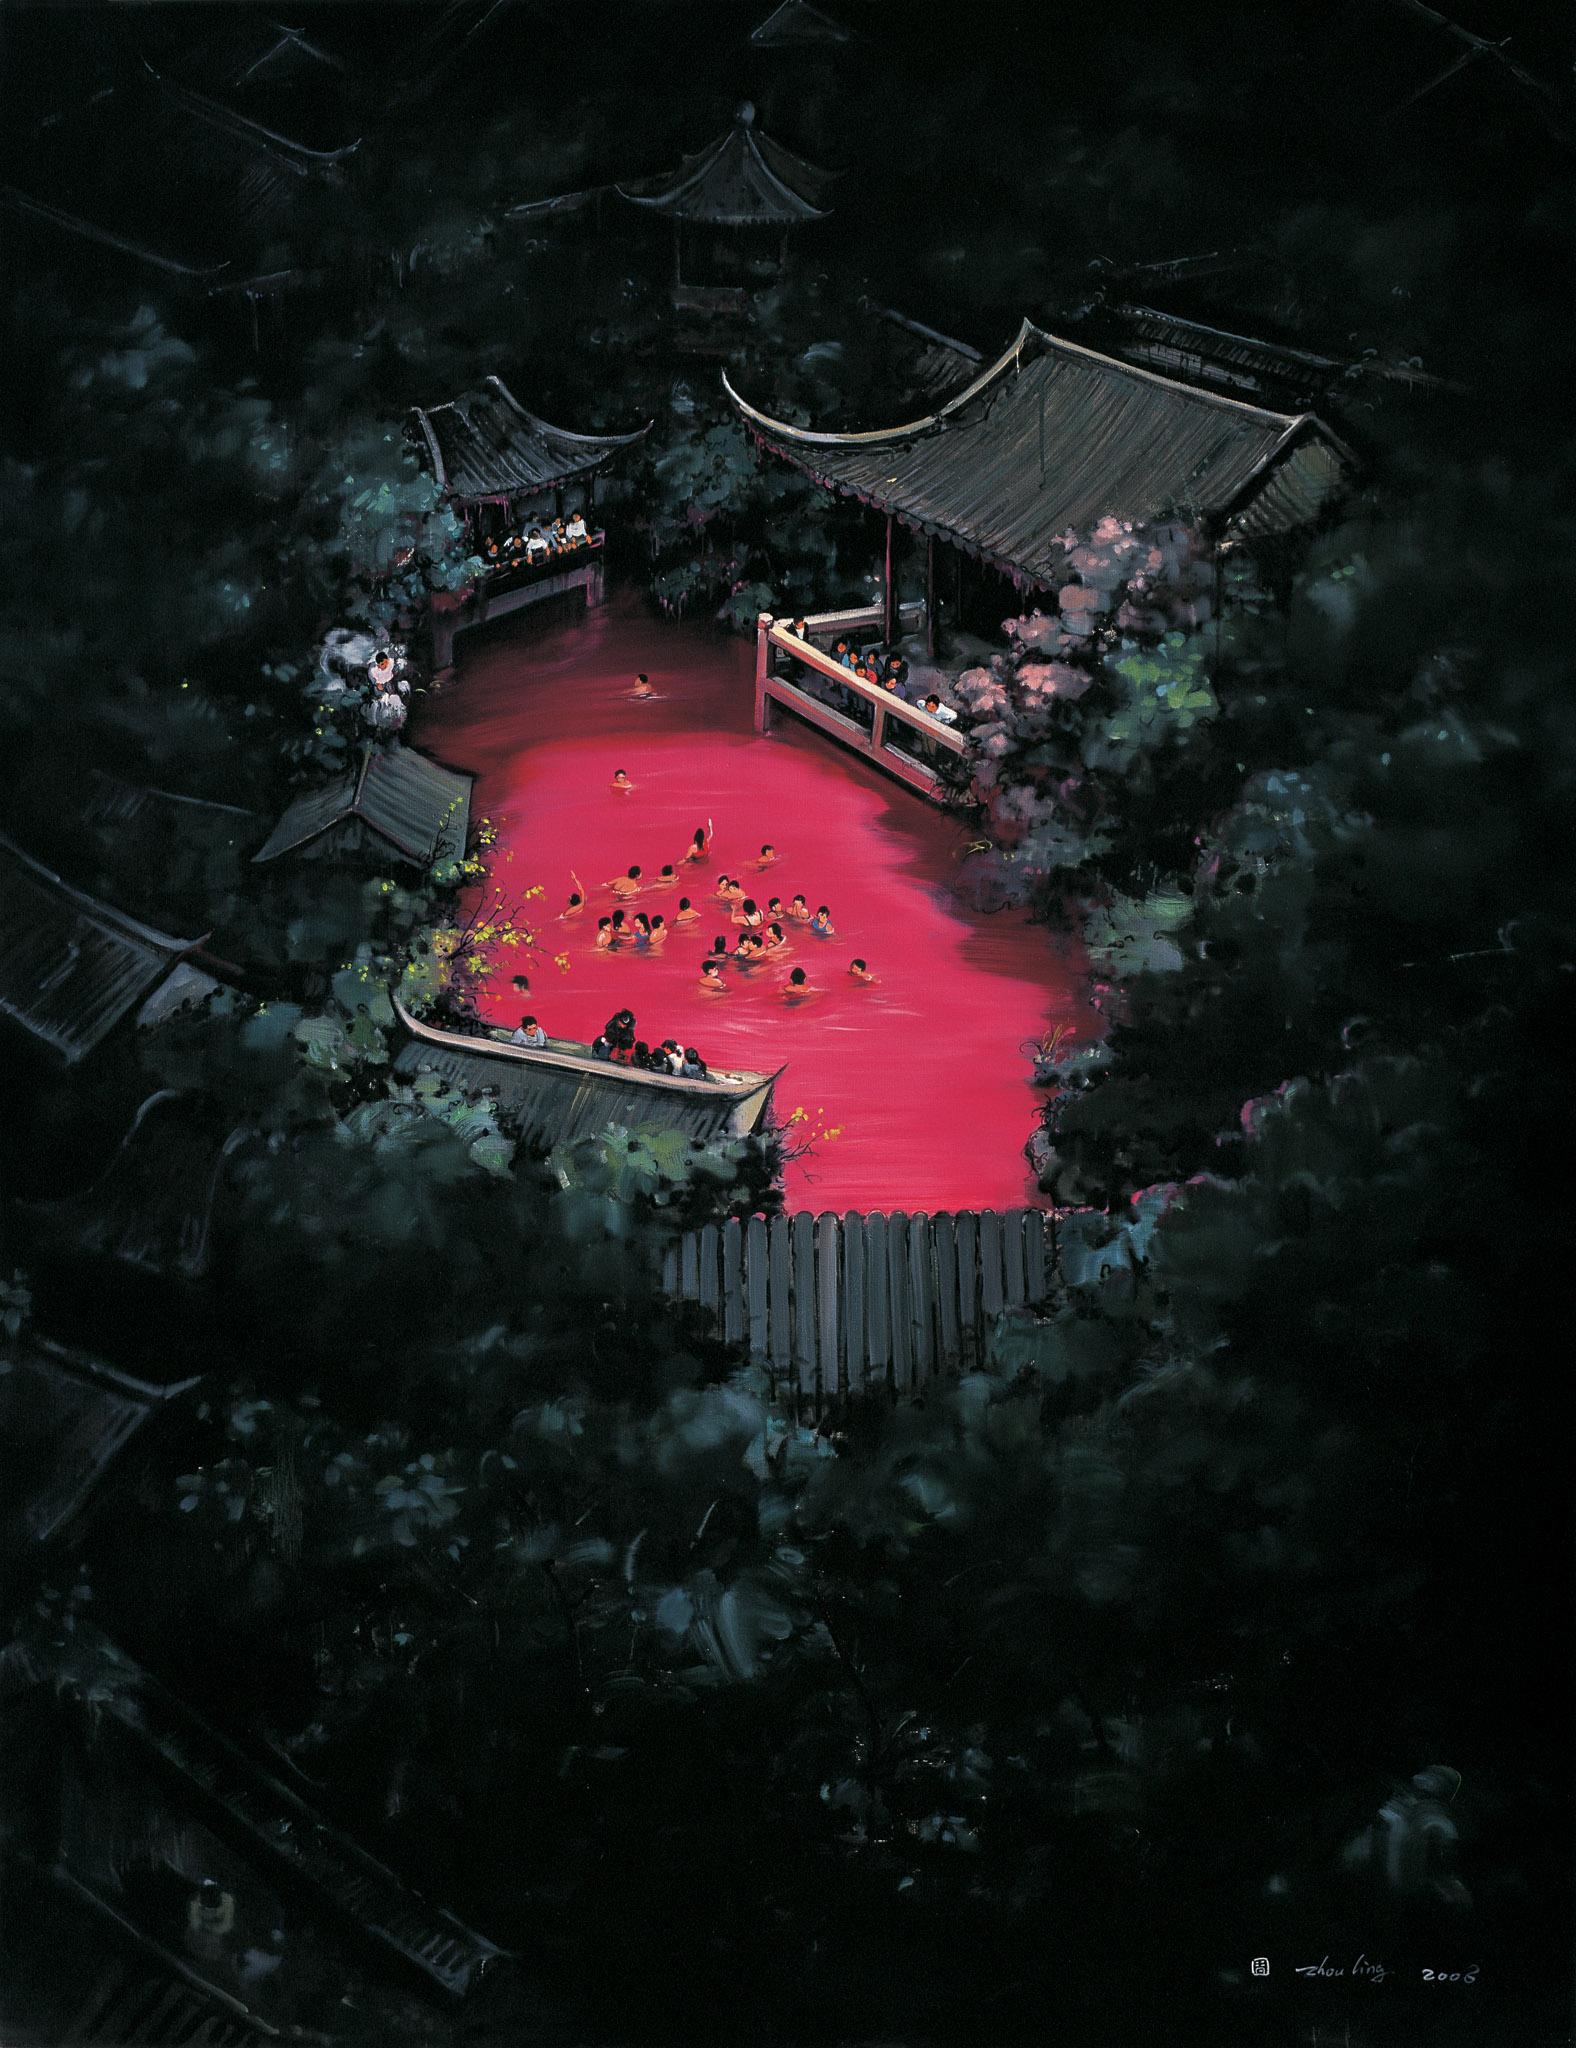 Zhou Jinhua 周金华, Golden Age No.2 黄金时代 No.2, 2008, Oil on canvas 布面油画, 190 x 145 cm